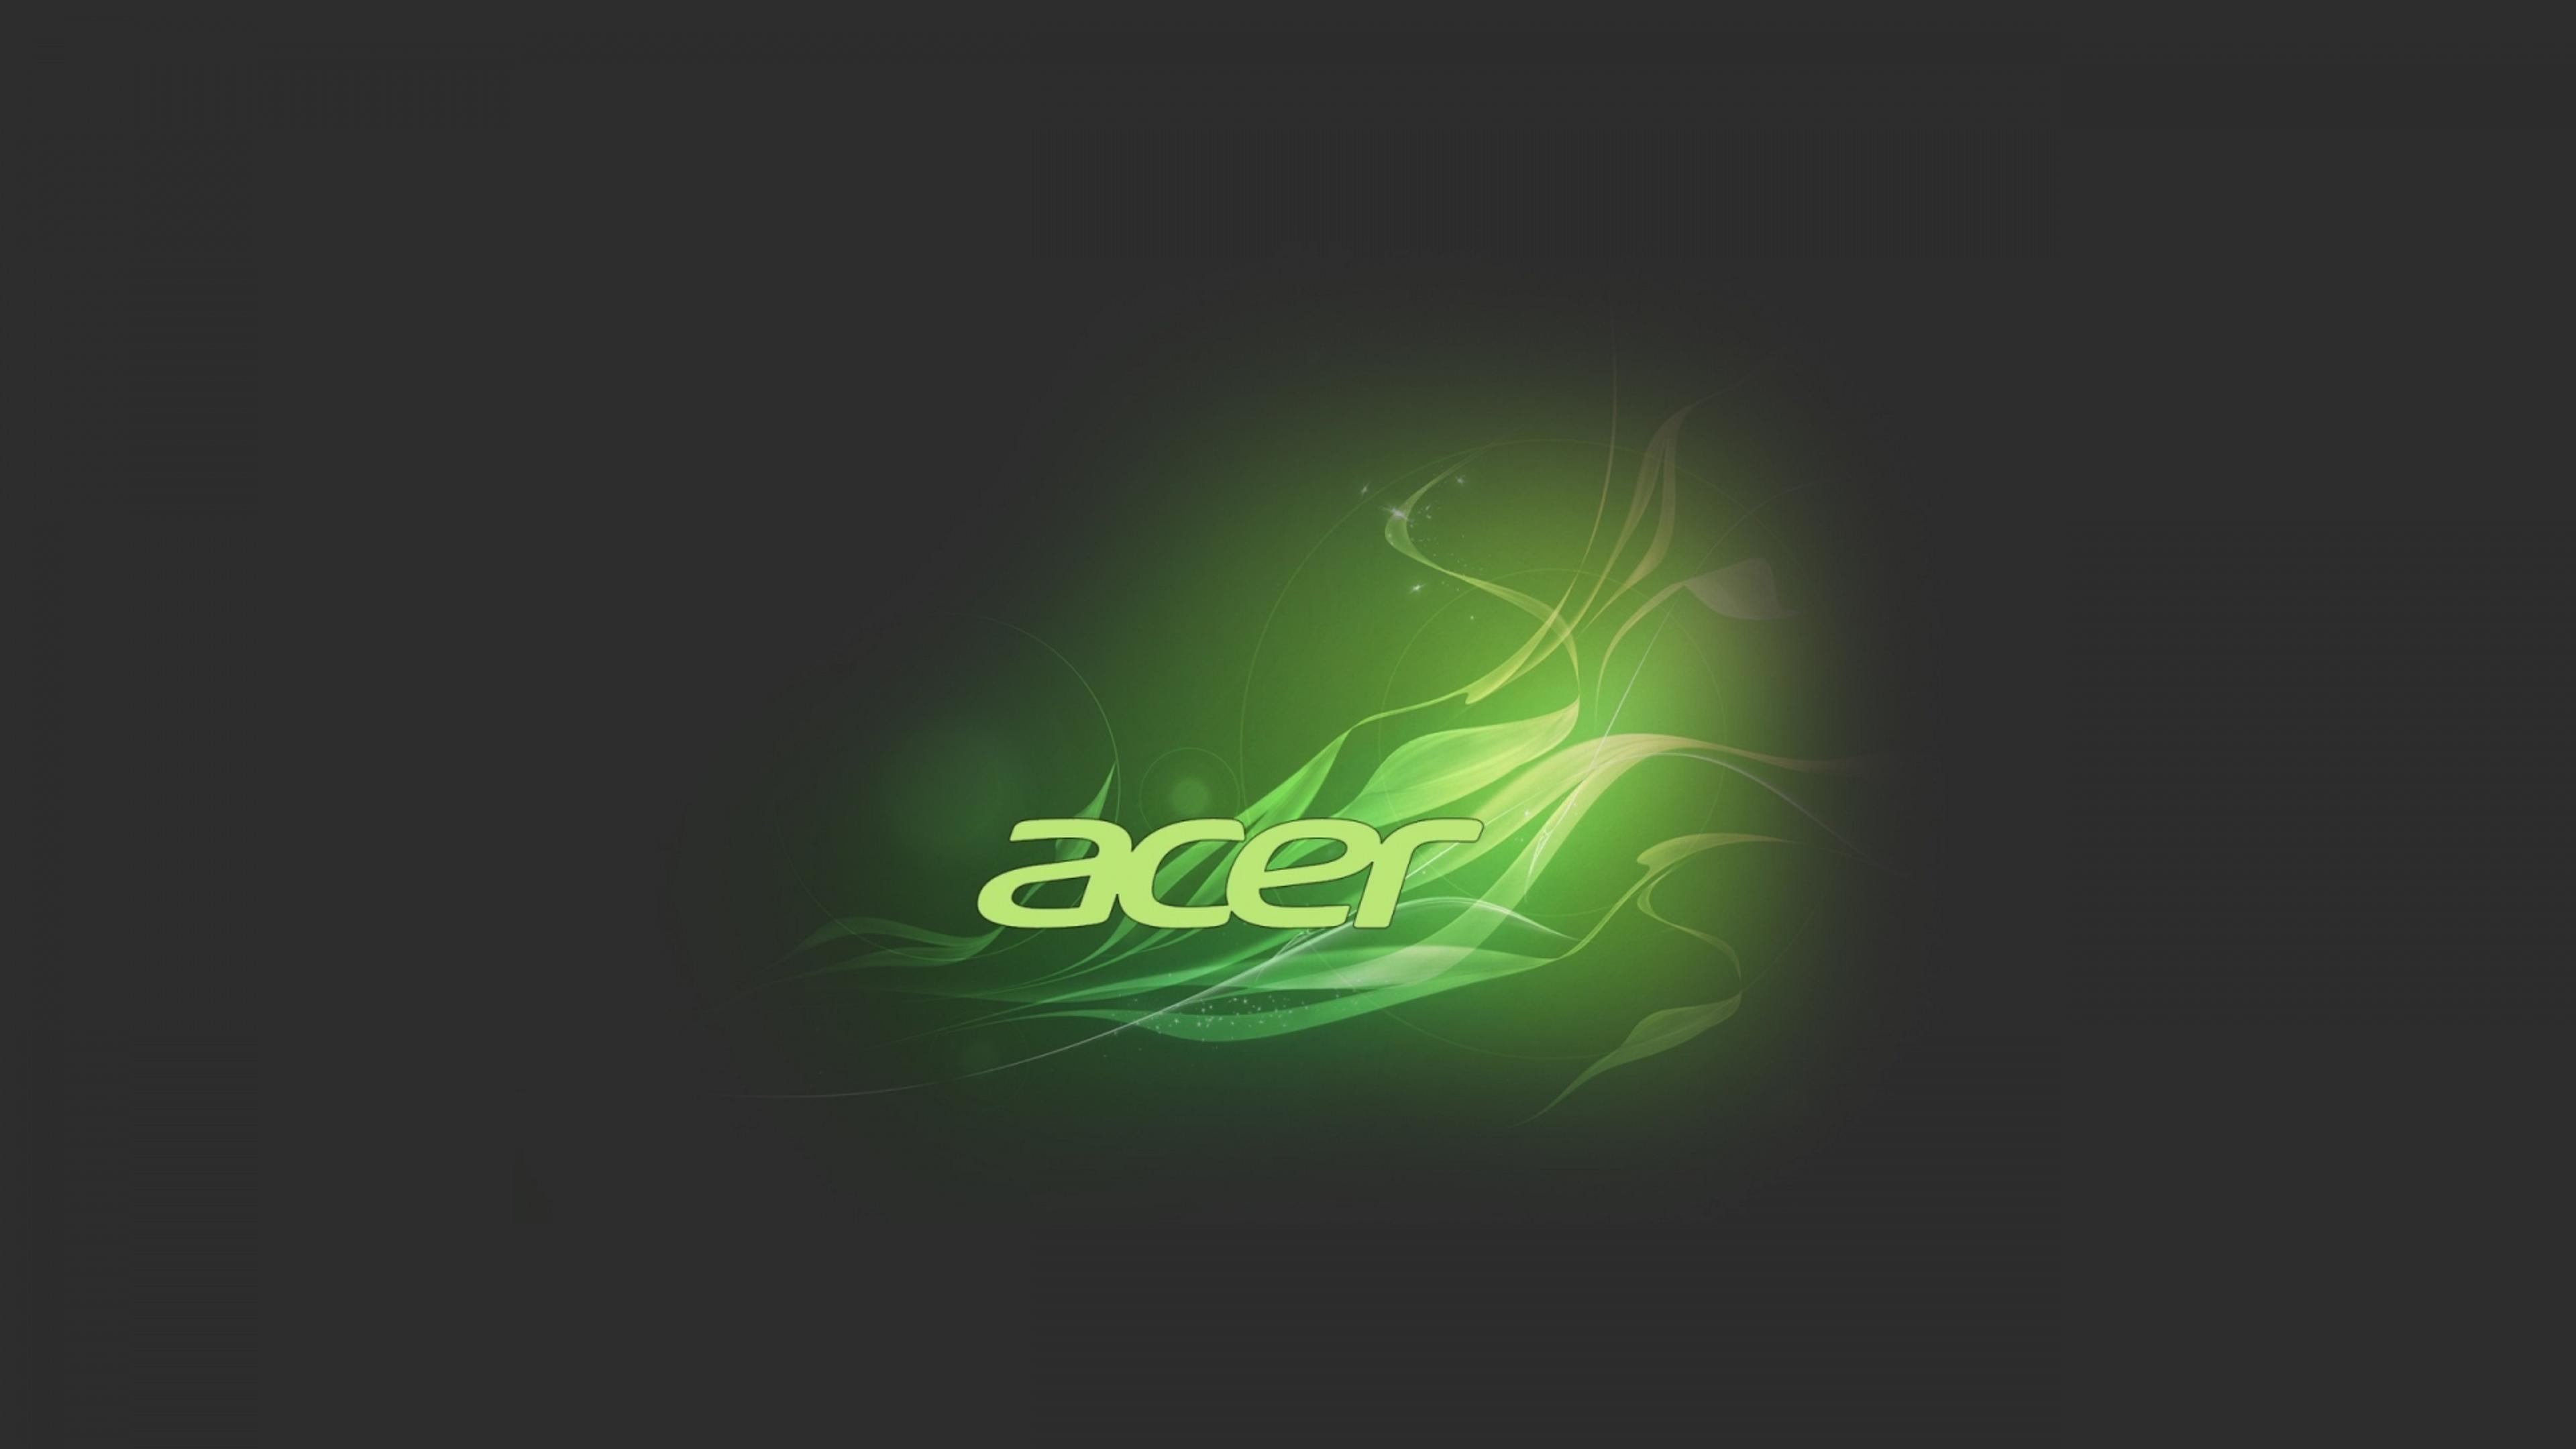 green and black acer logo wallpaper wallpaper download lexus f logo vector lexus f logo vector